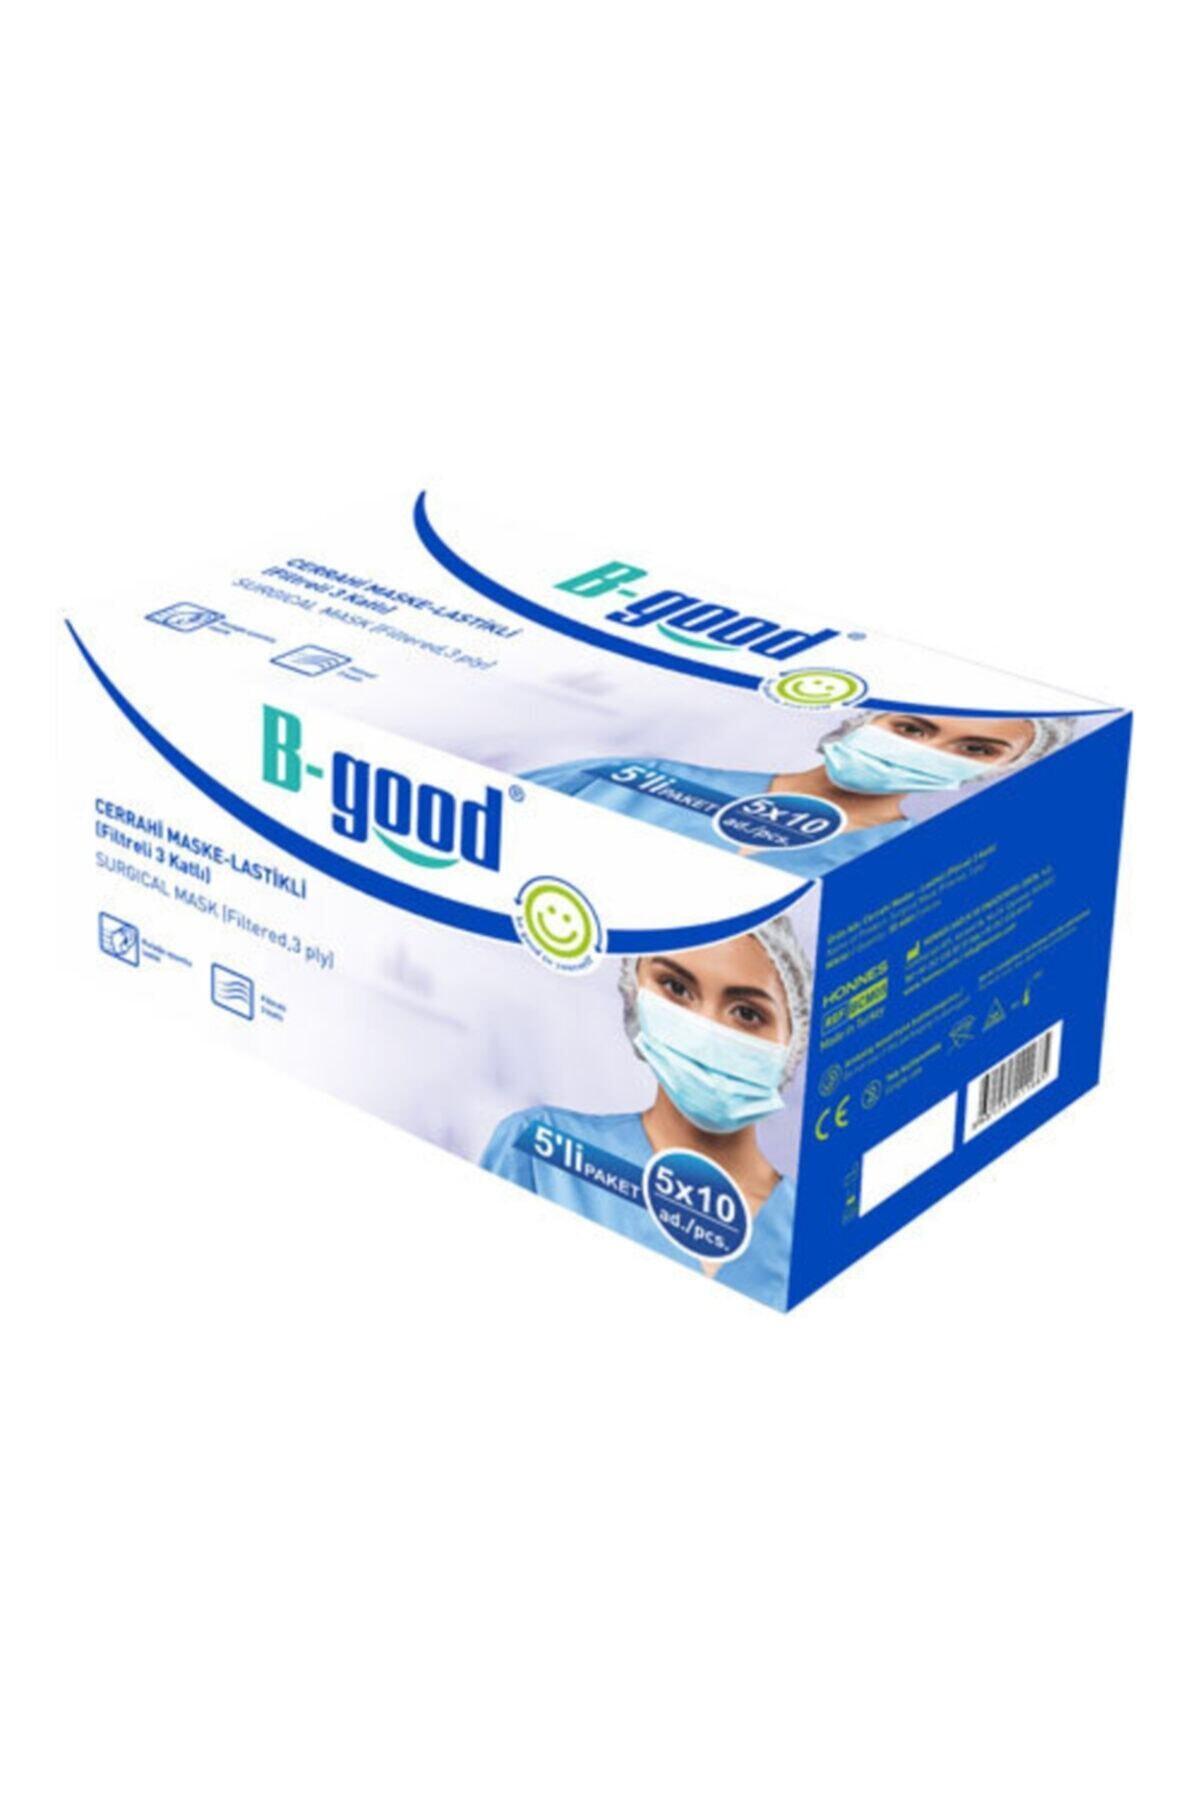 Cerrahi Maske Mavi 3 Katlı Burun Telli 5'li Paket